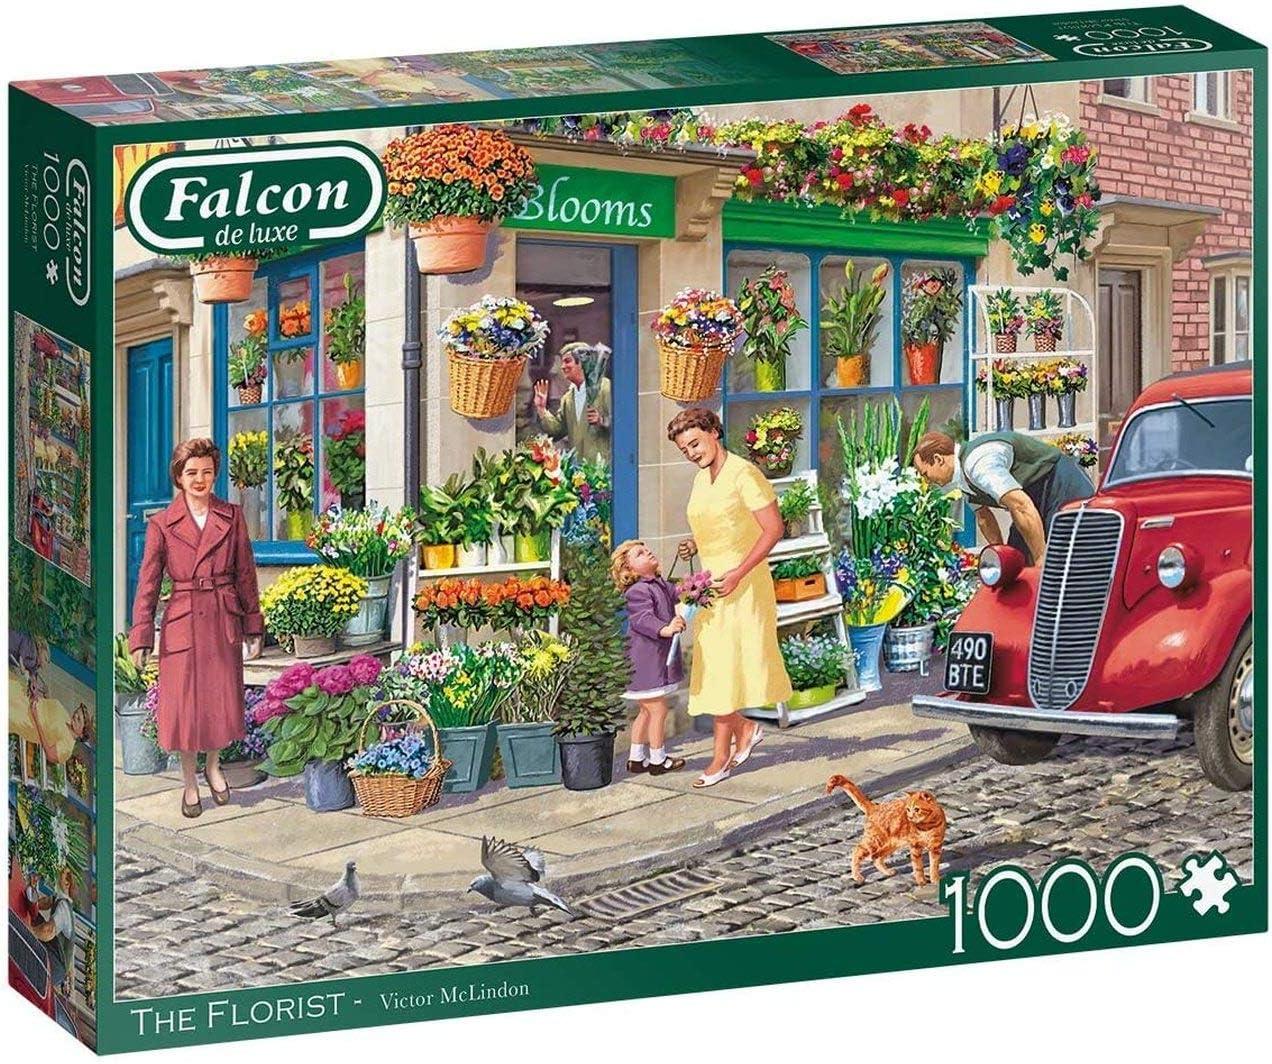 Falcon The Florist 1000 Piece Jigsaw Puzzle